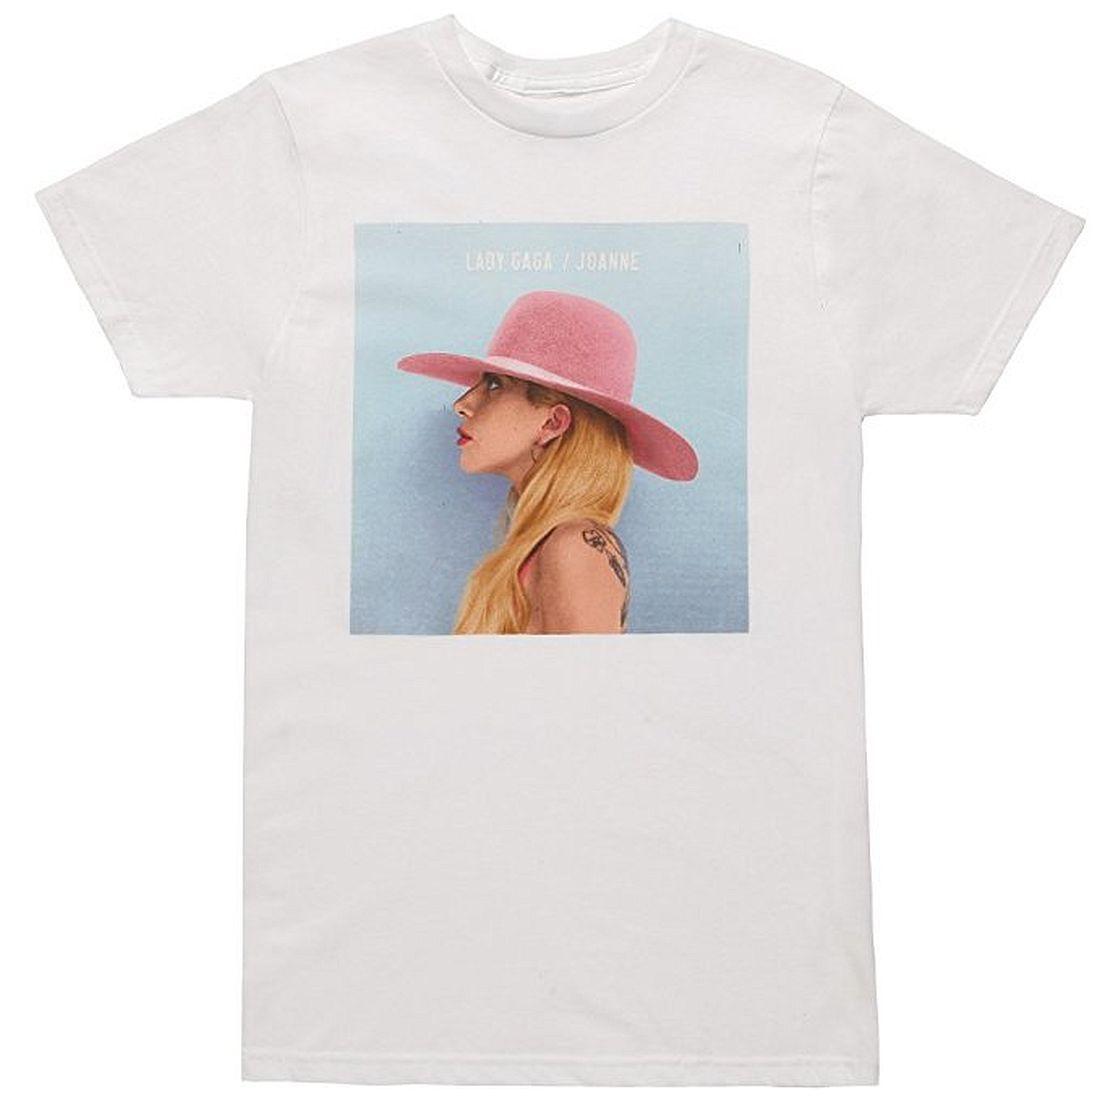 Gildan Lady Gaga Joanne Album Cover Mens T-Shirt SM, MD, LG, XL New